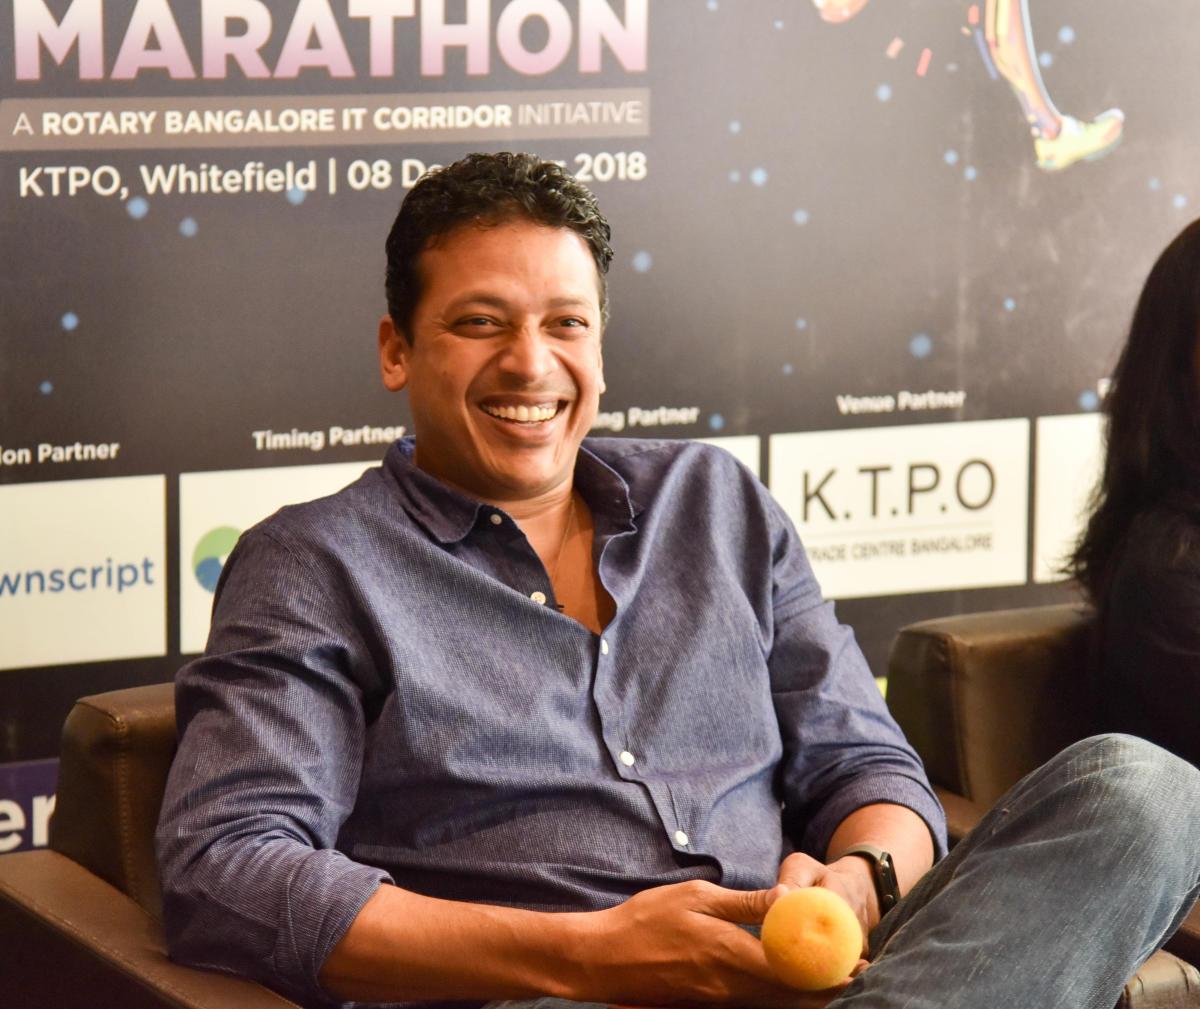 Former Tennis Player Mahesh Bhupathi. DH File Photo